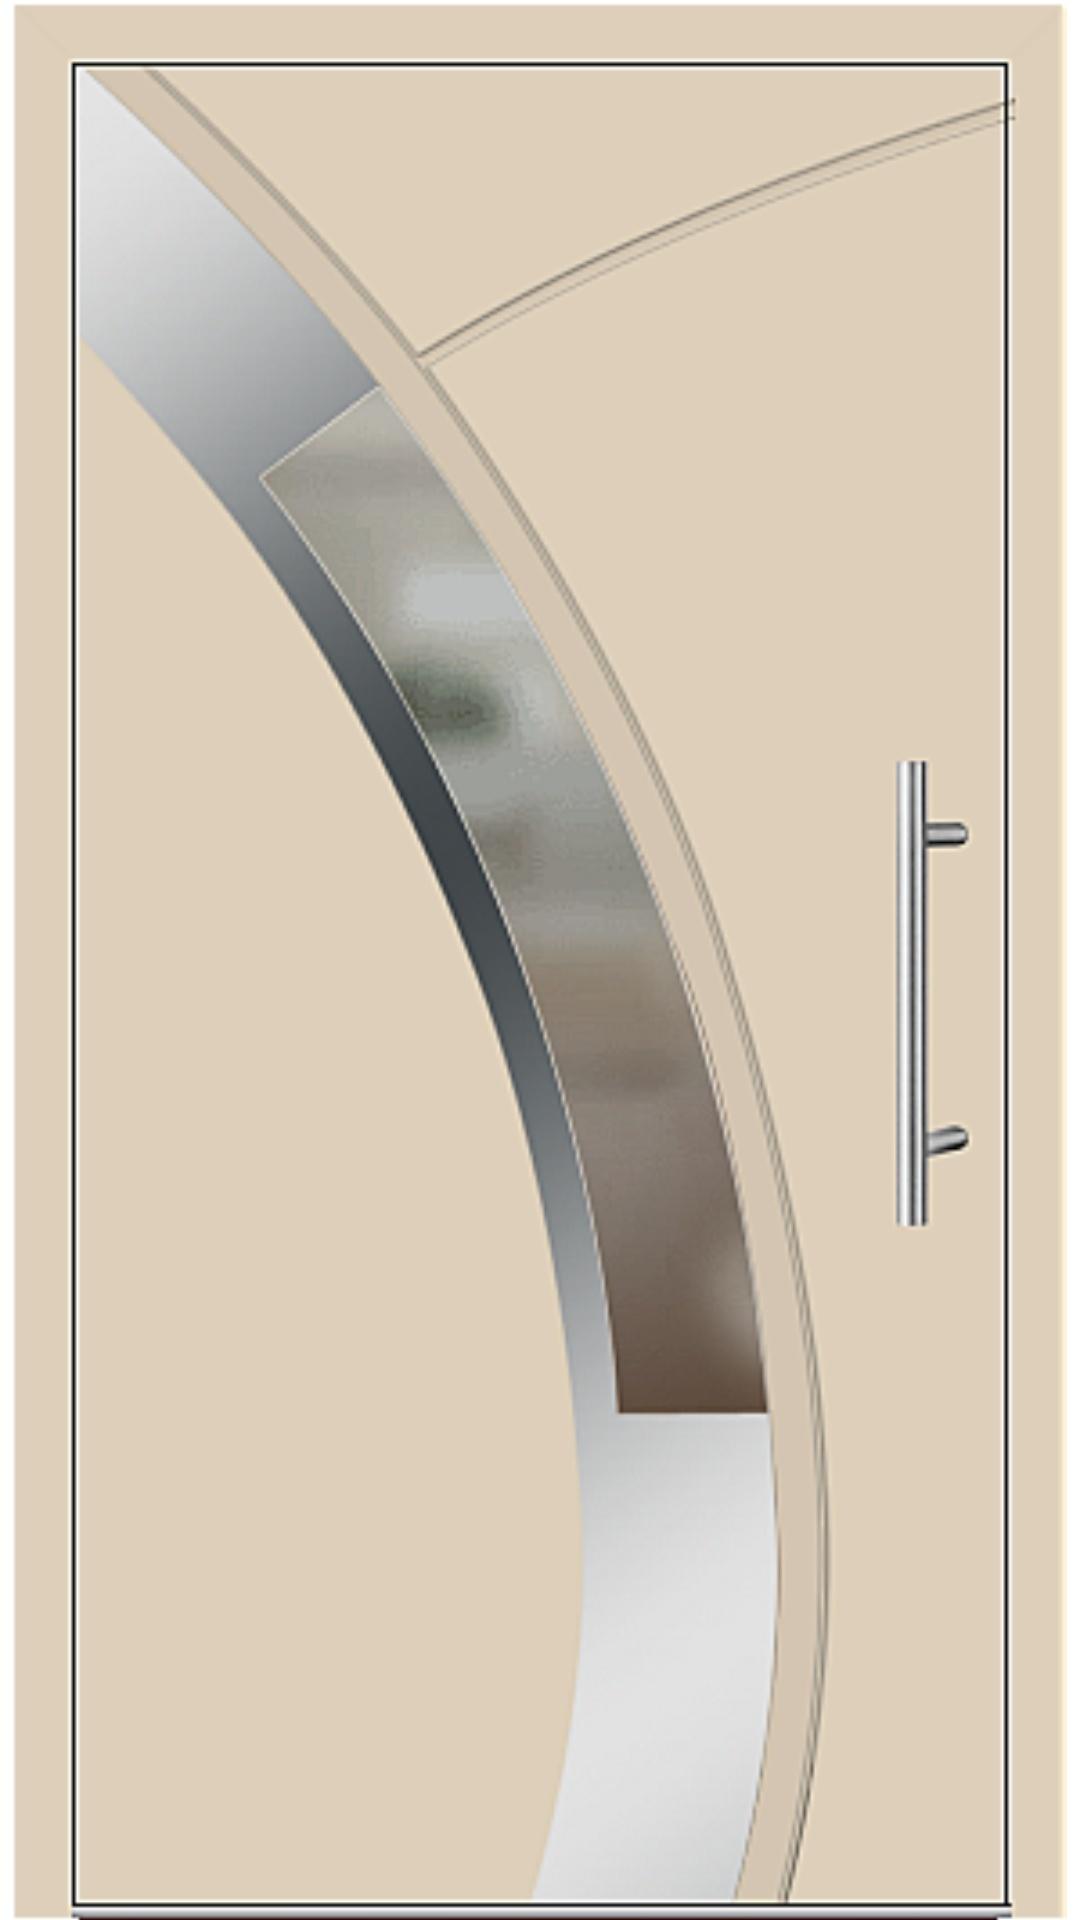 Aluminium Haustür Modell 6438-57 beige